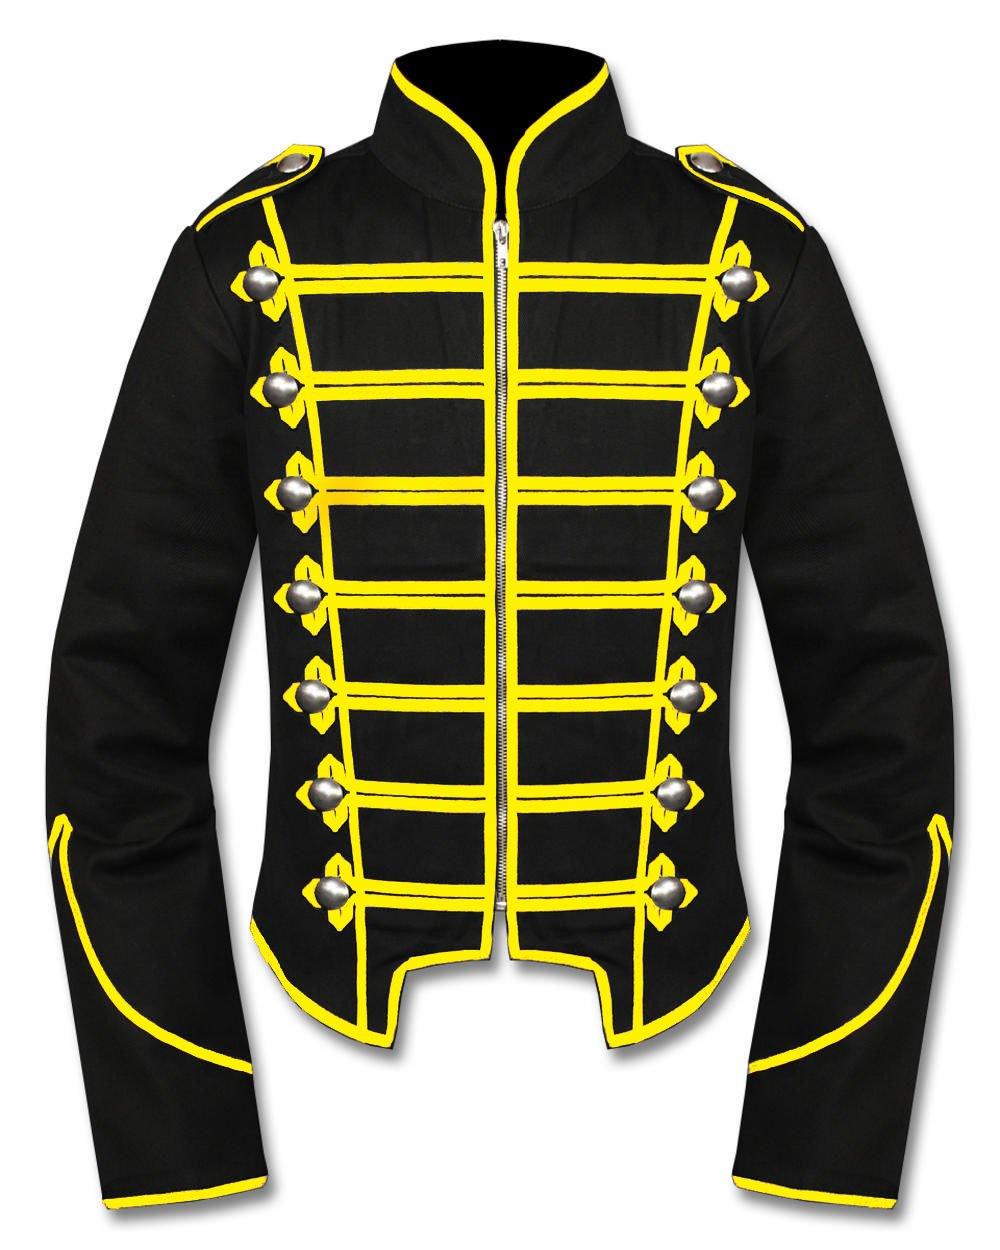 Handmade Men Black/Yellow Military Marching Band Drummer Jacket